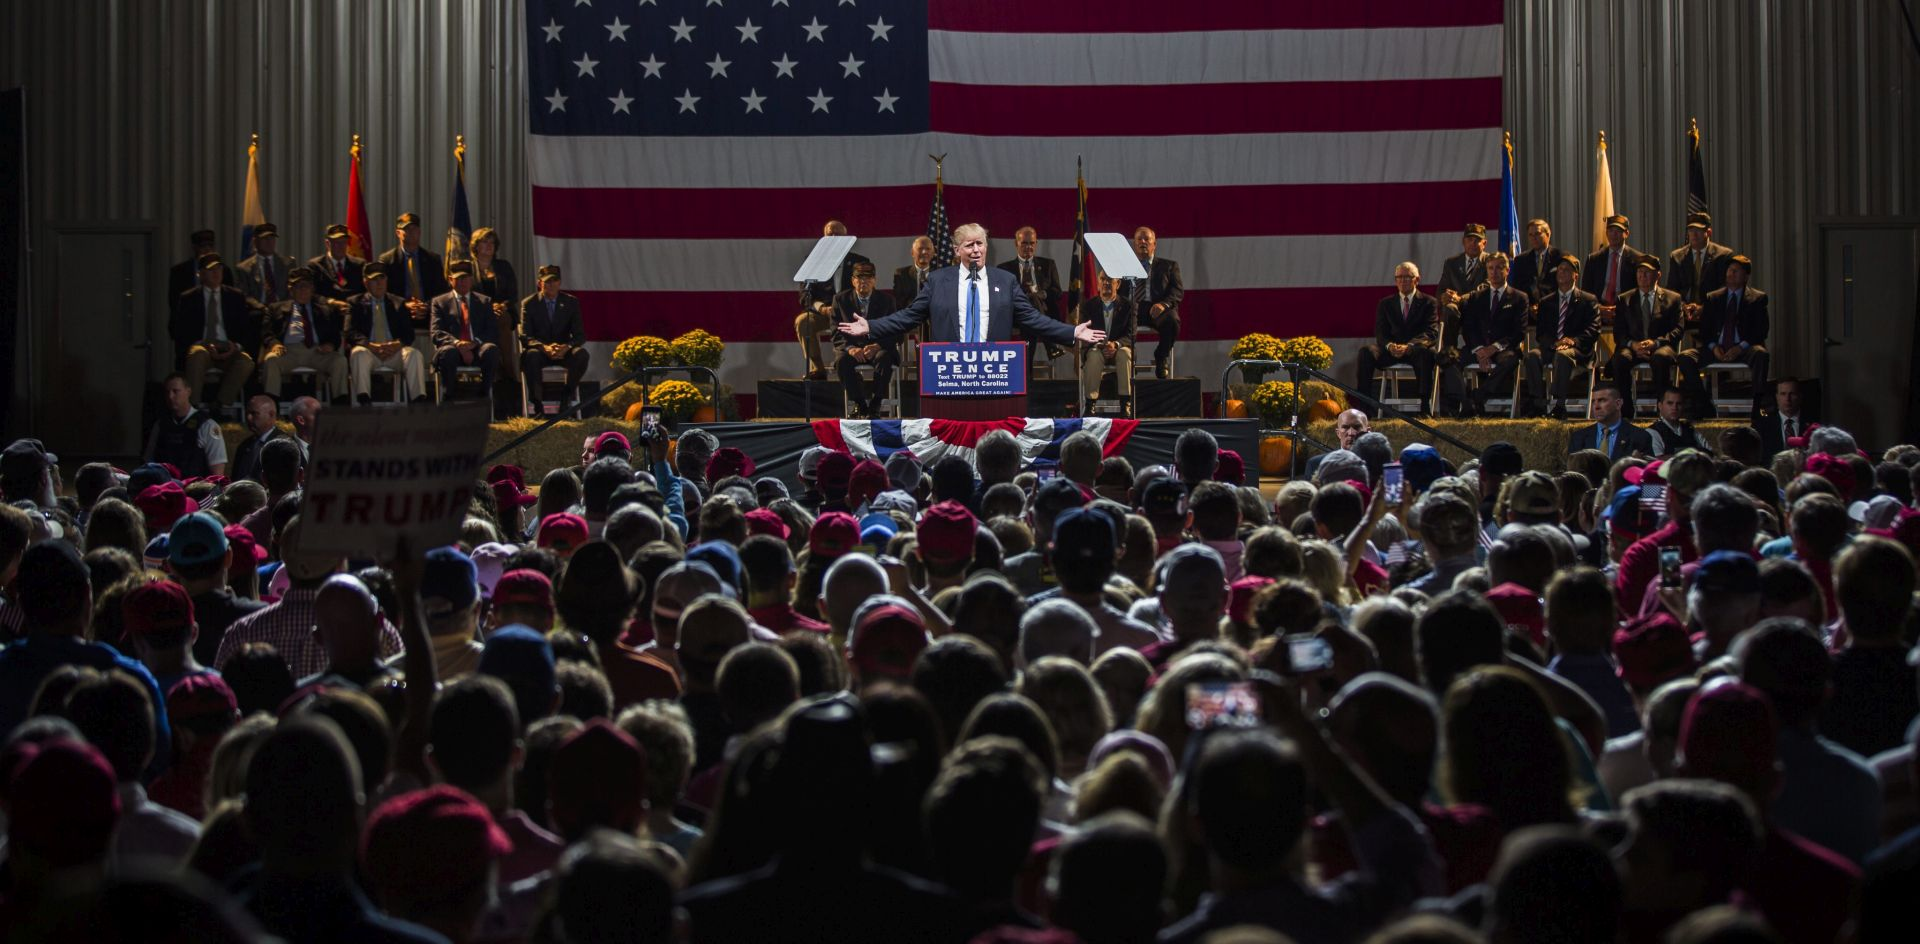 PREVARIO STUDENTE: Trump mora platiti 25 milijuna dolara kazne